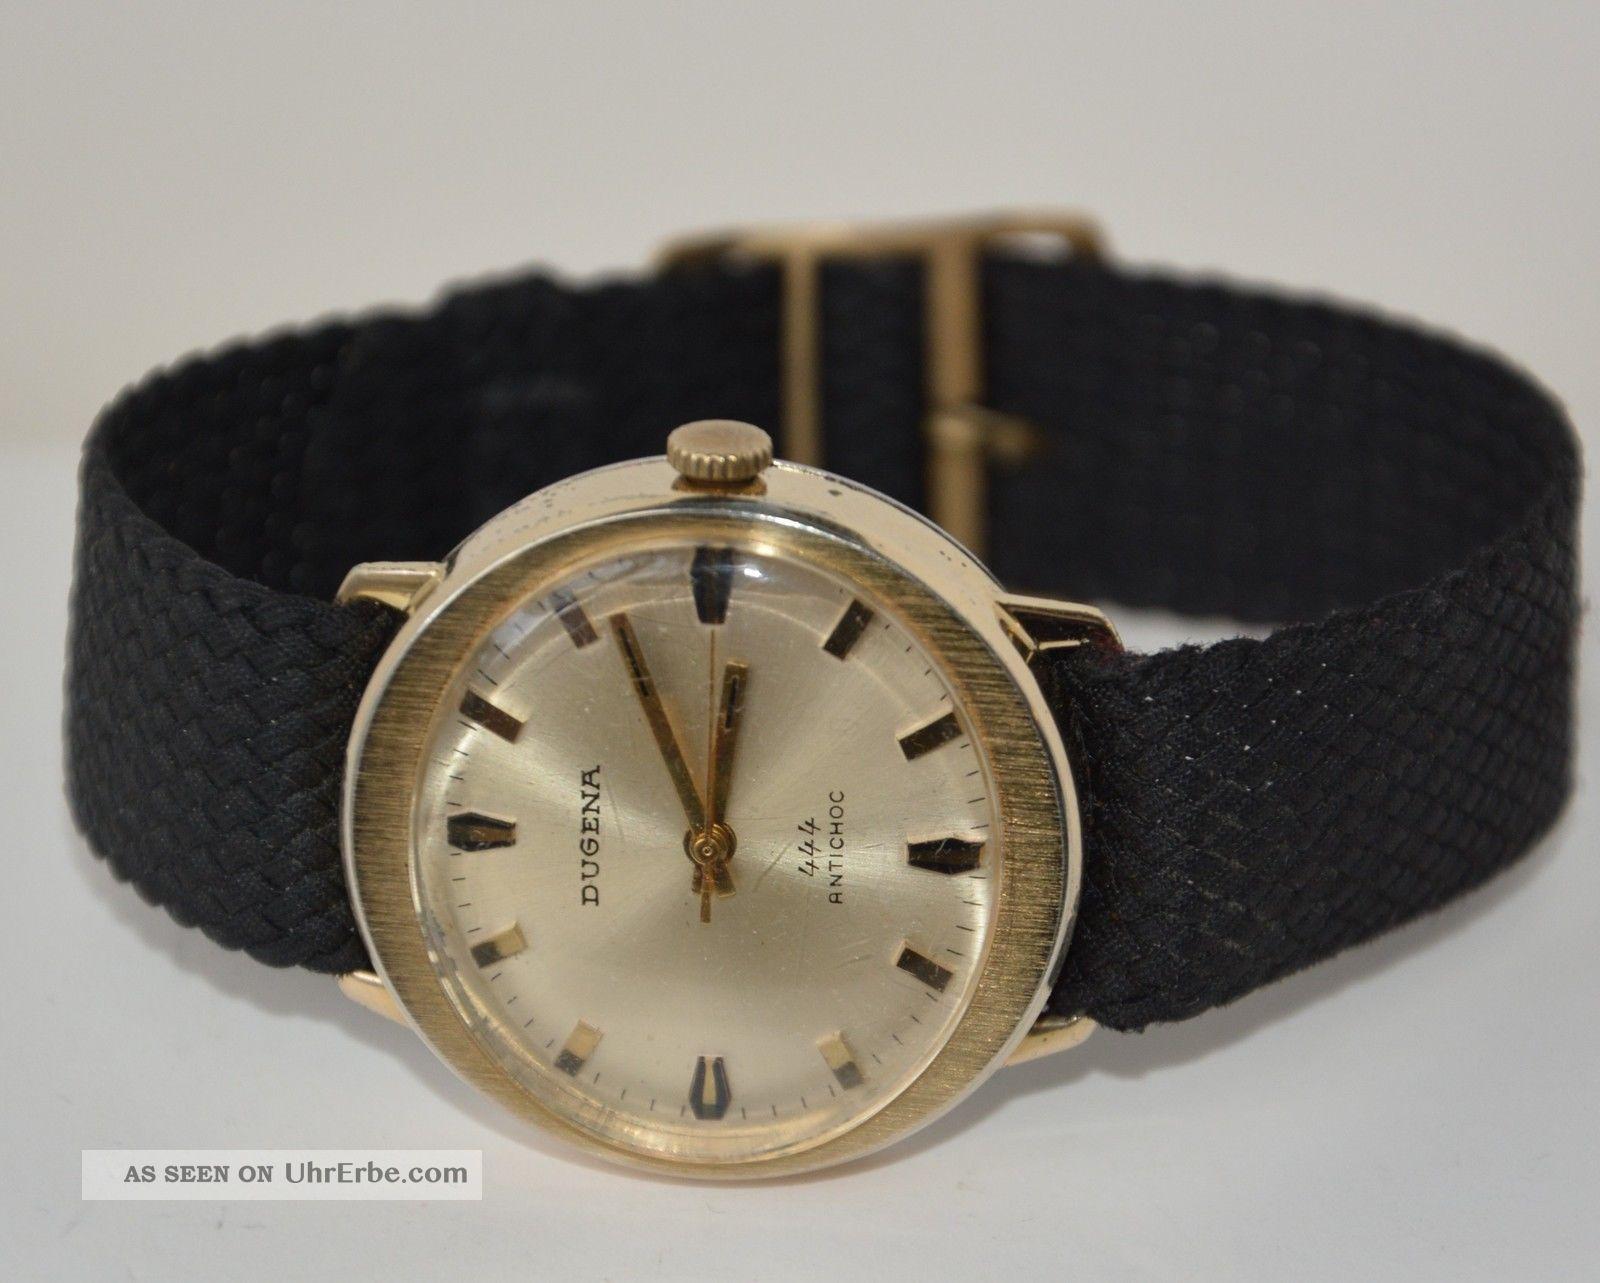 Dugena 444 Antischock 17 Jewels Cal.  2111.  Handaufzug Vintage Sammler. Armbanduhren Bild